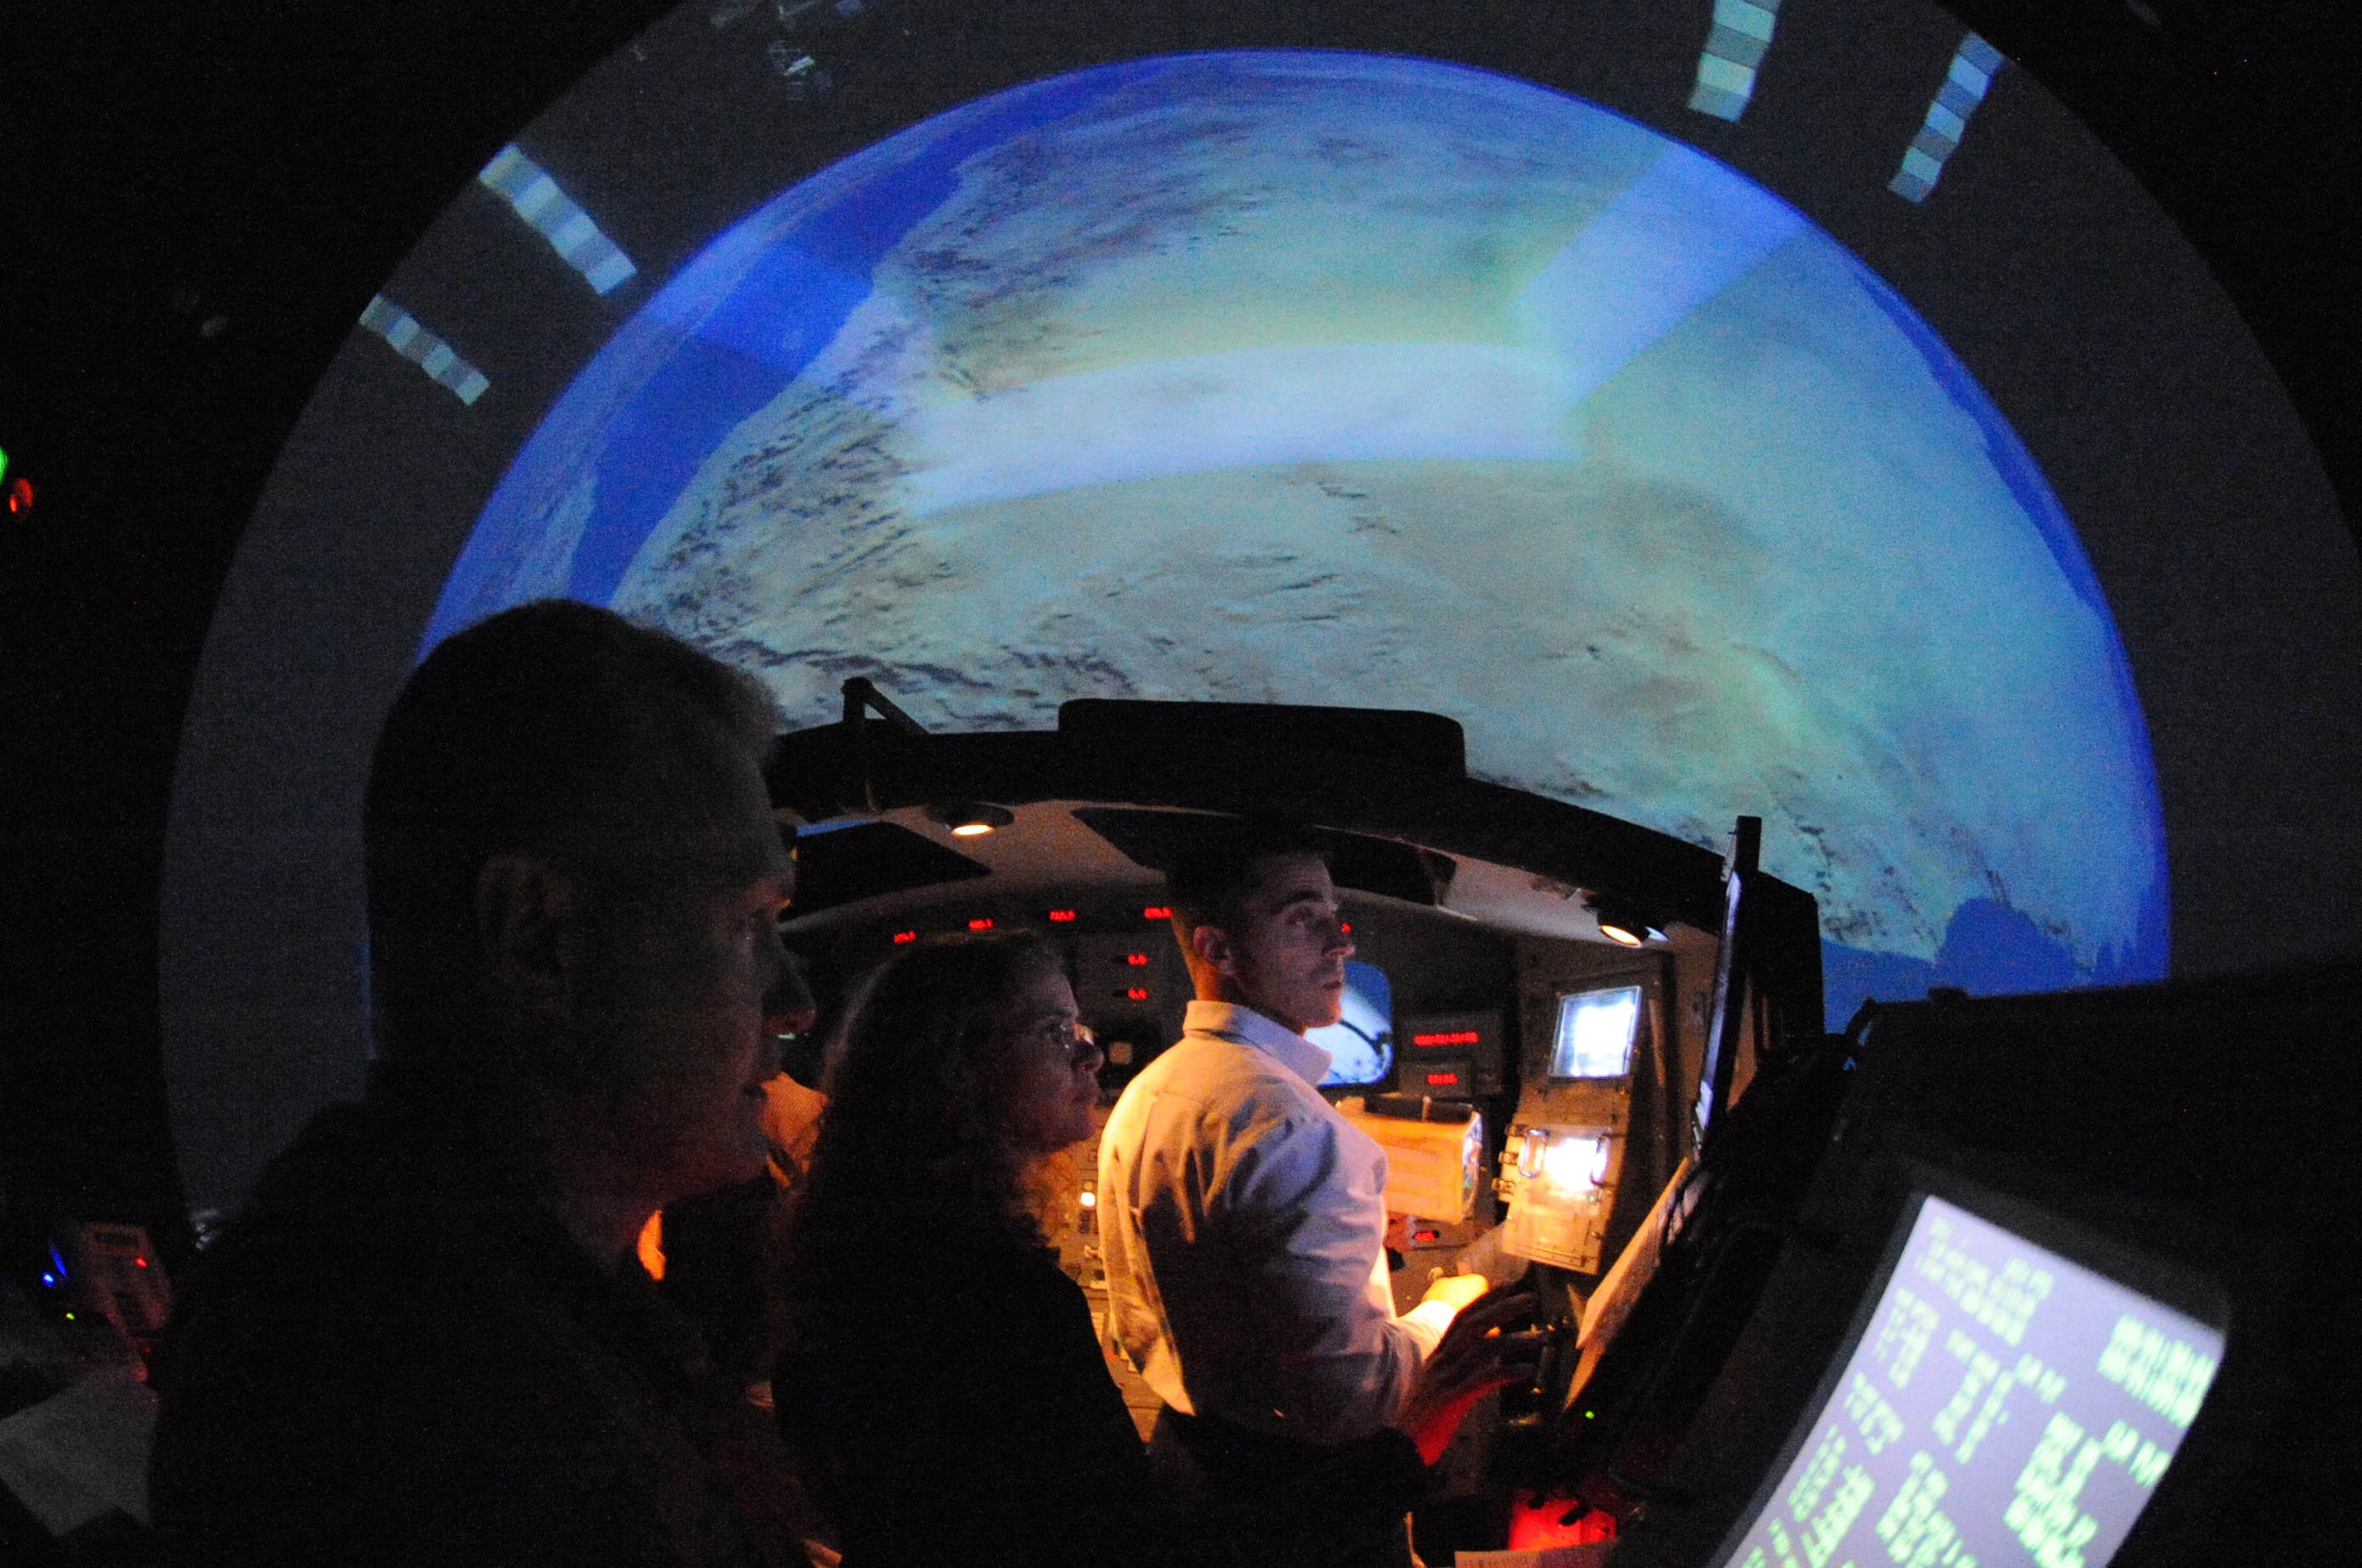 space shuttle simulator vr - photo #16